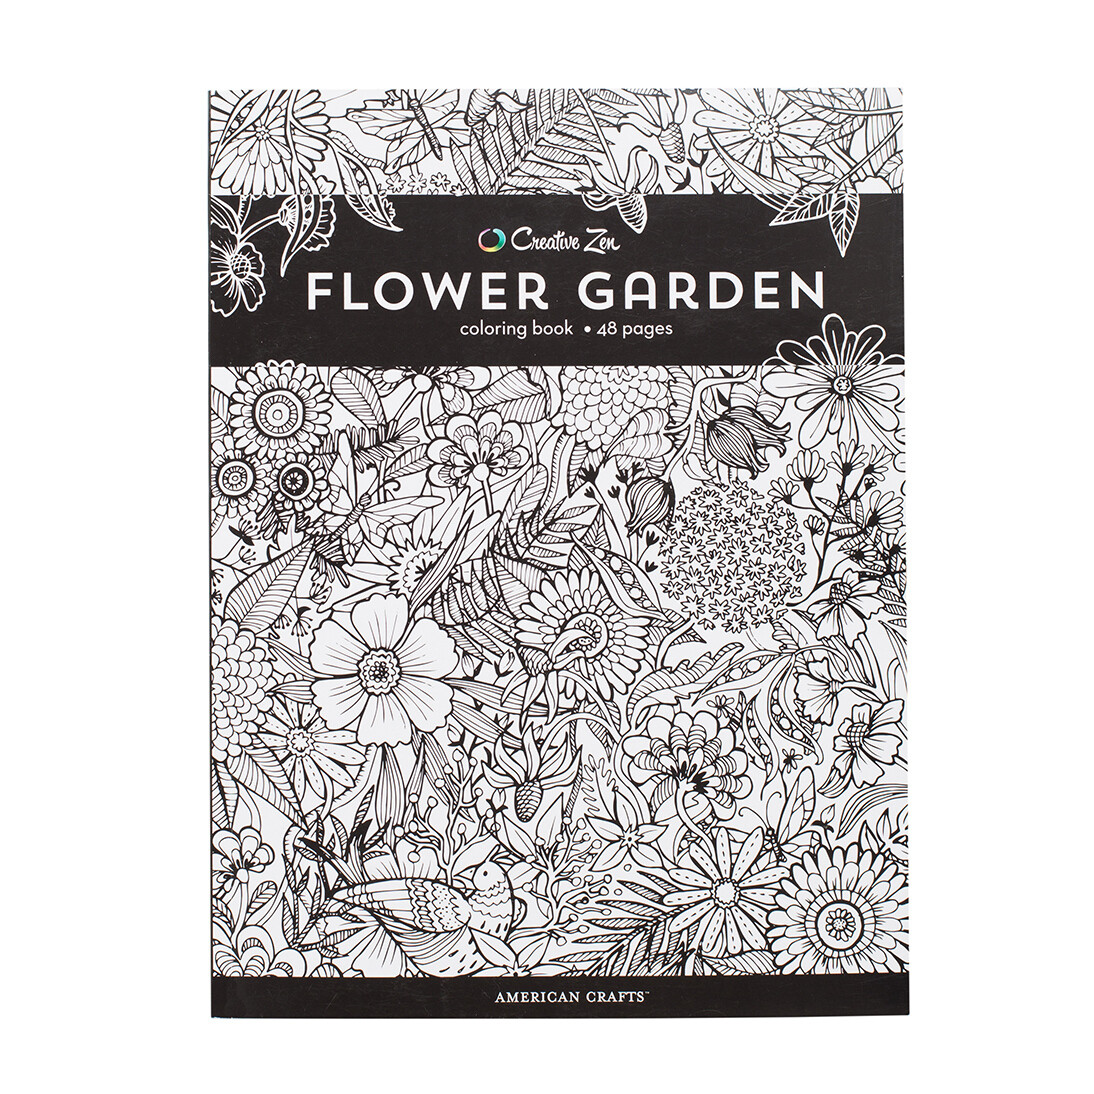 Creative Zen Flower Garden Coloring Book  48 pages